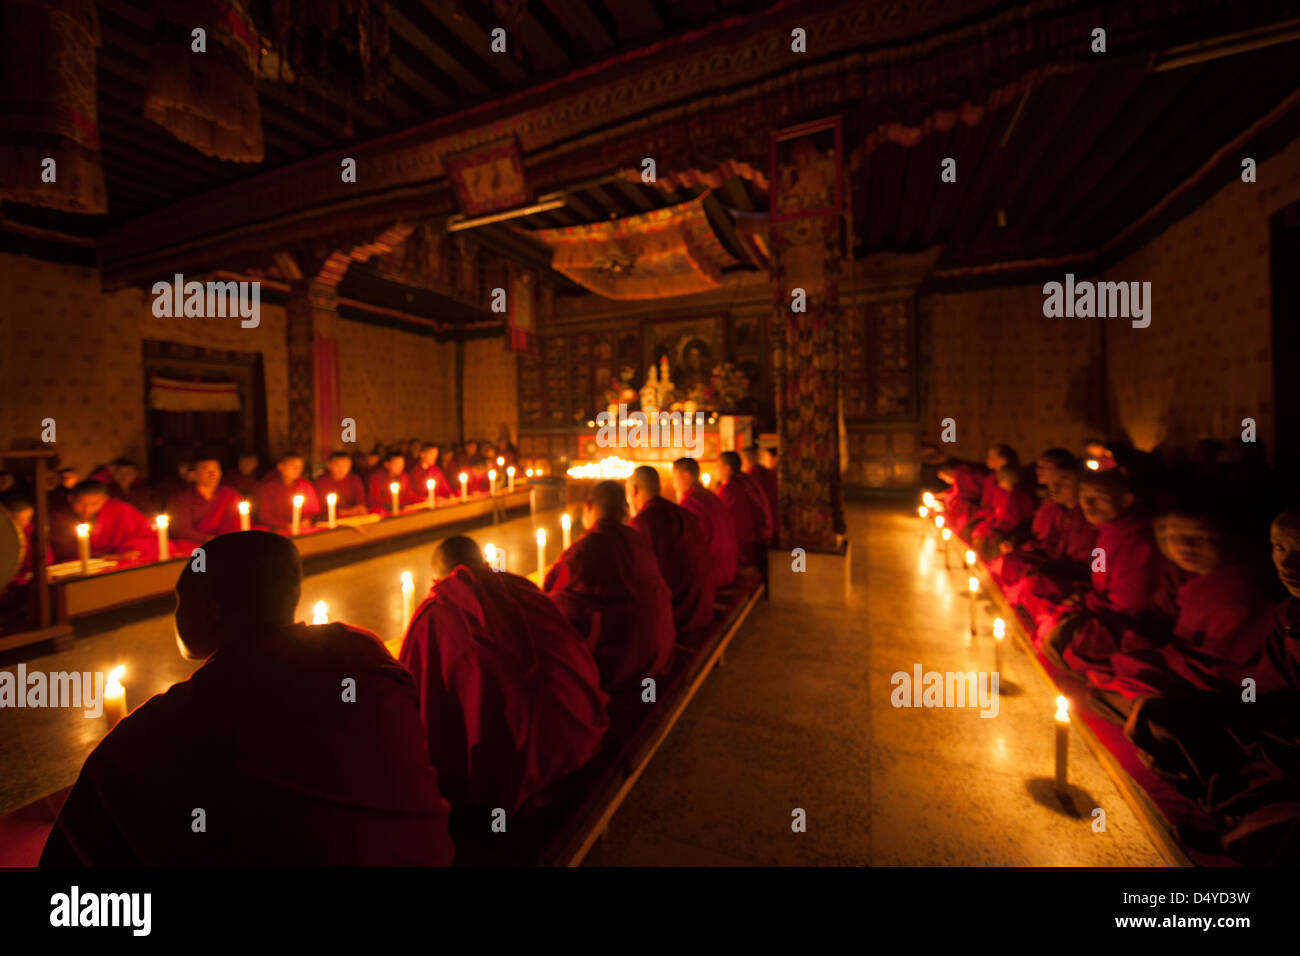 Bhutan, monks in temple. - Stock Image